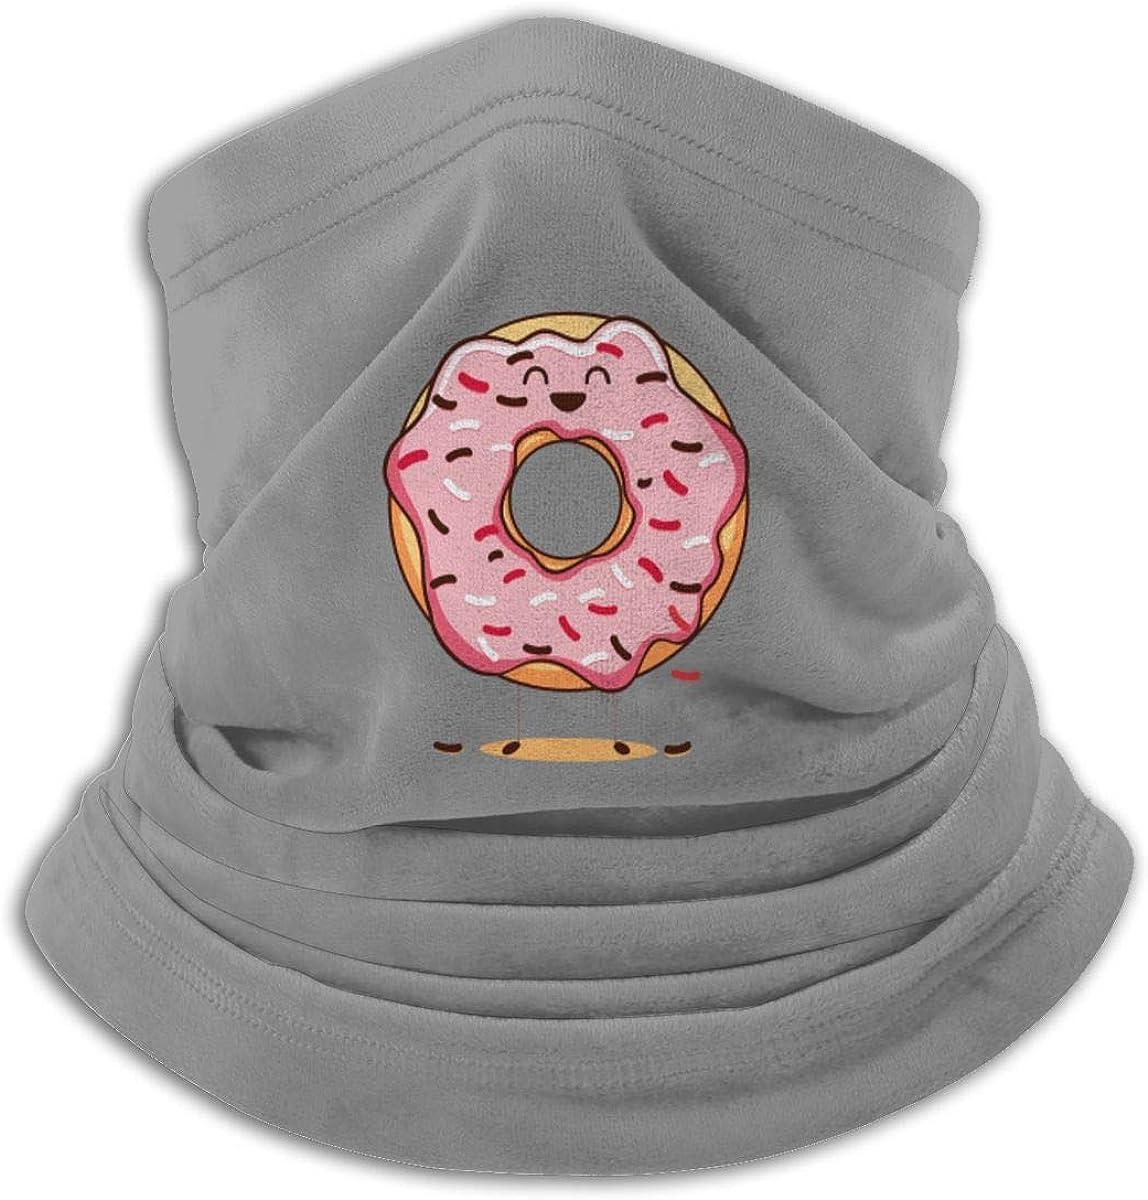 Doughnut Day Black Multi-function Neck Warmer Gaiter Polyester Neck Warmer Windproof Winter Neck Gaiter Cold Weather Scarf For Men Women